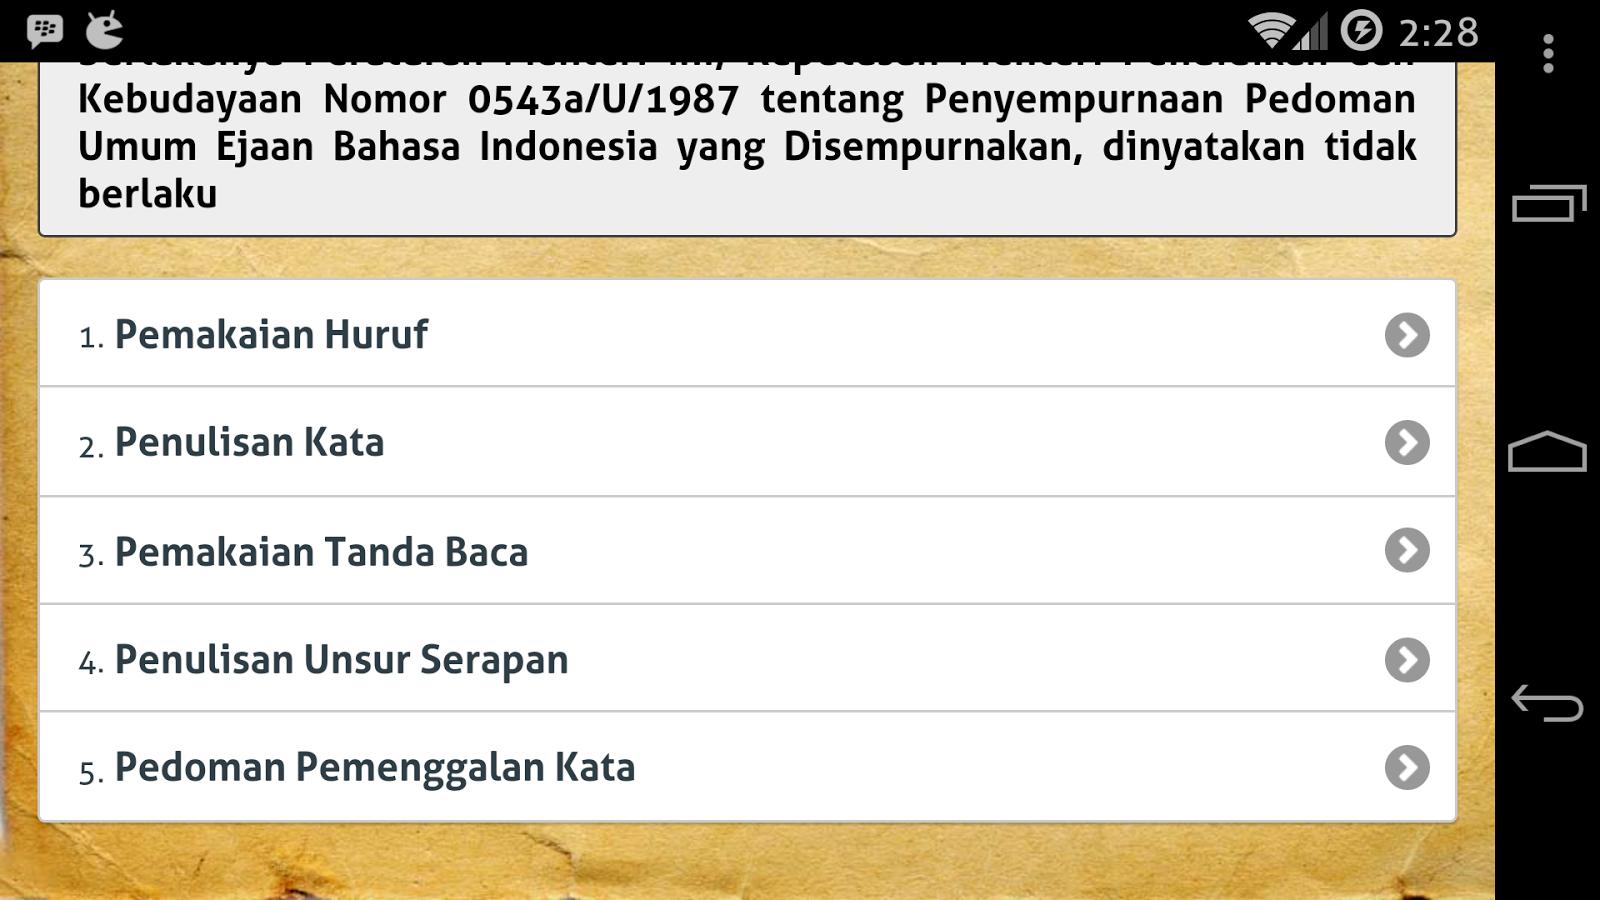 Eyd Dan Tata Bahasa Indonesia